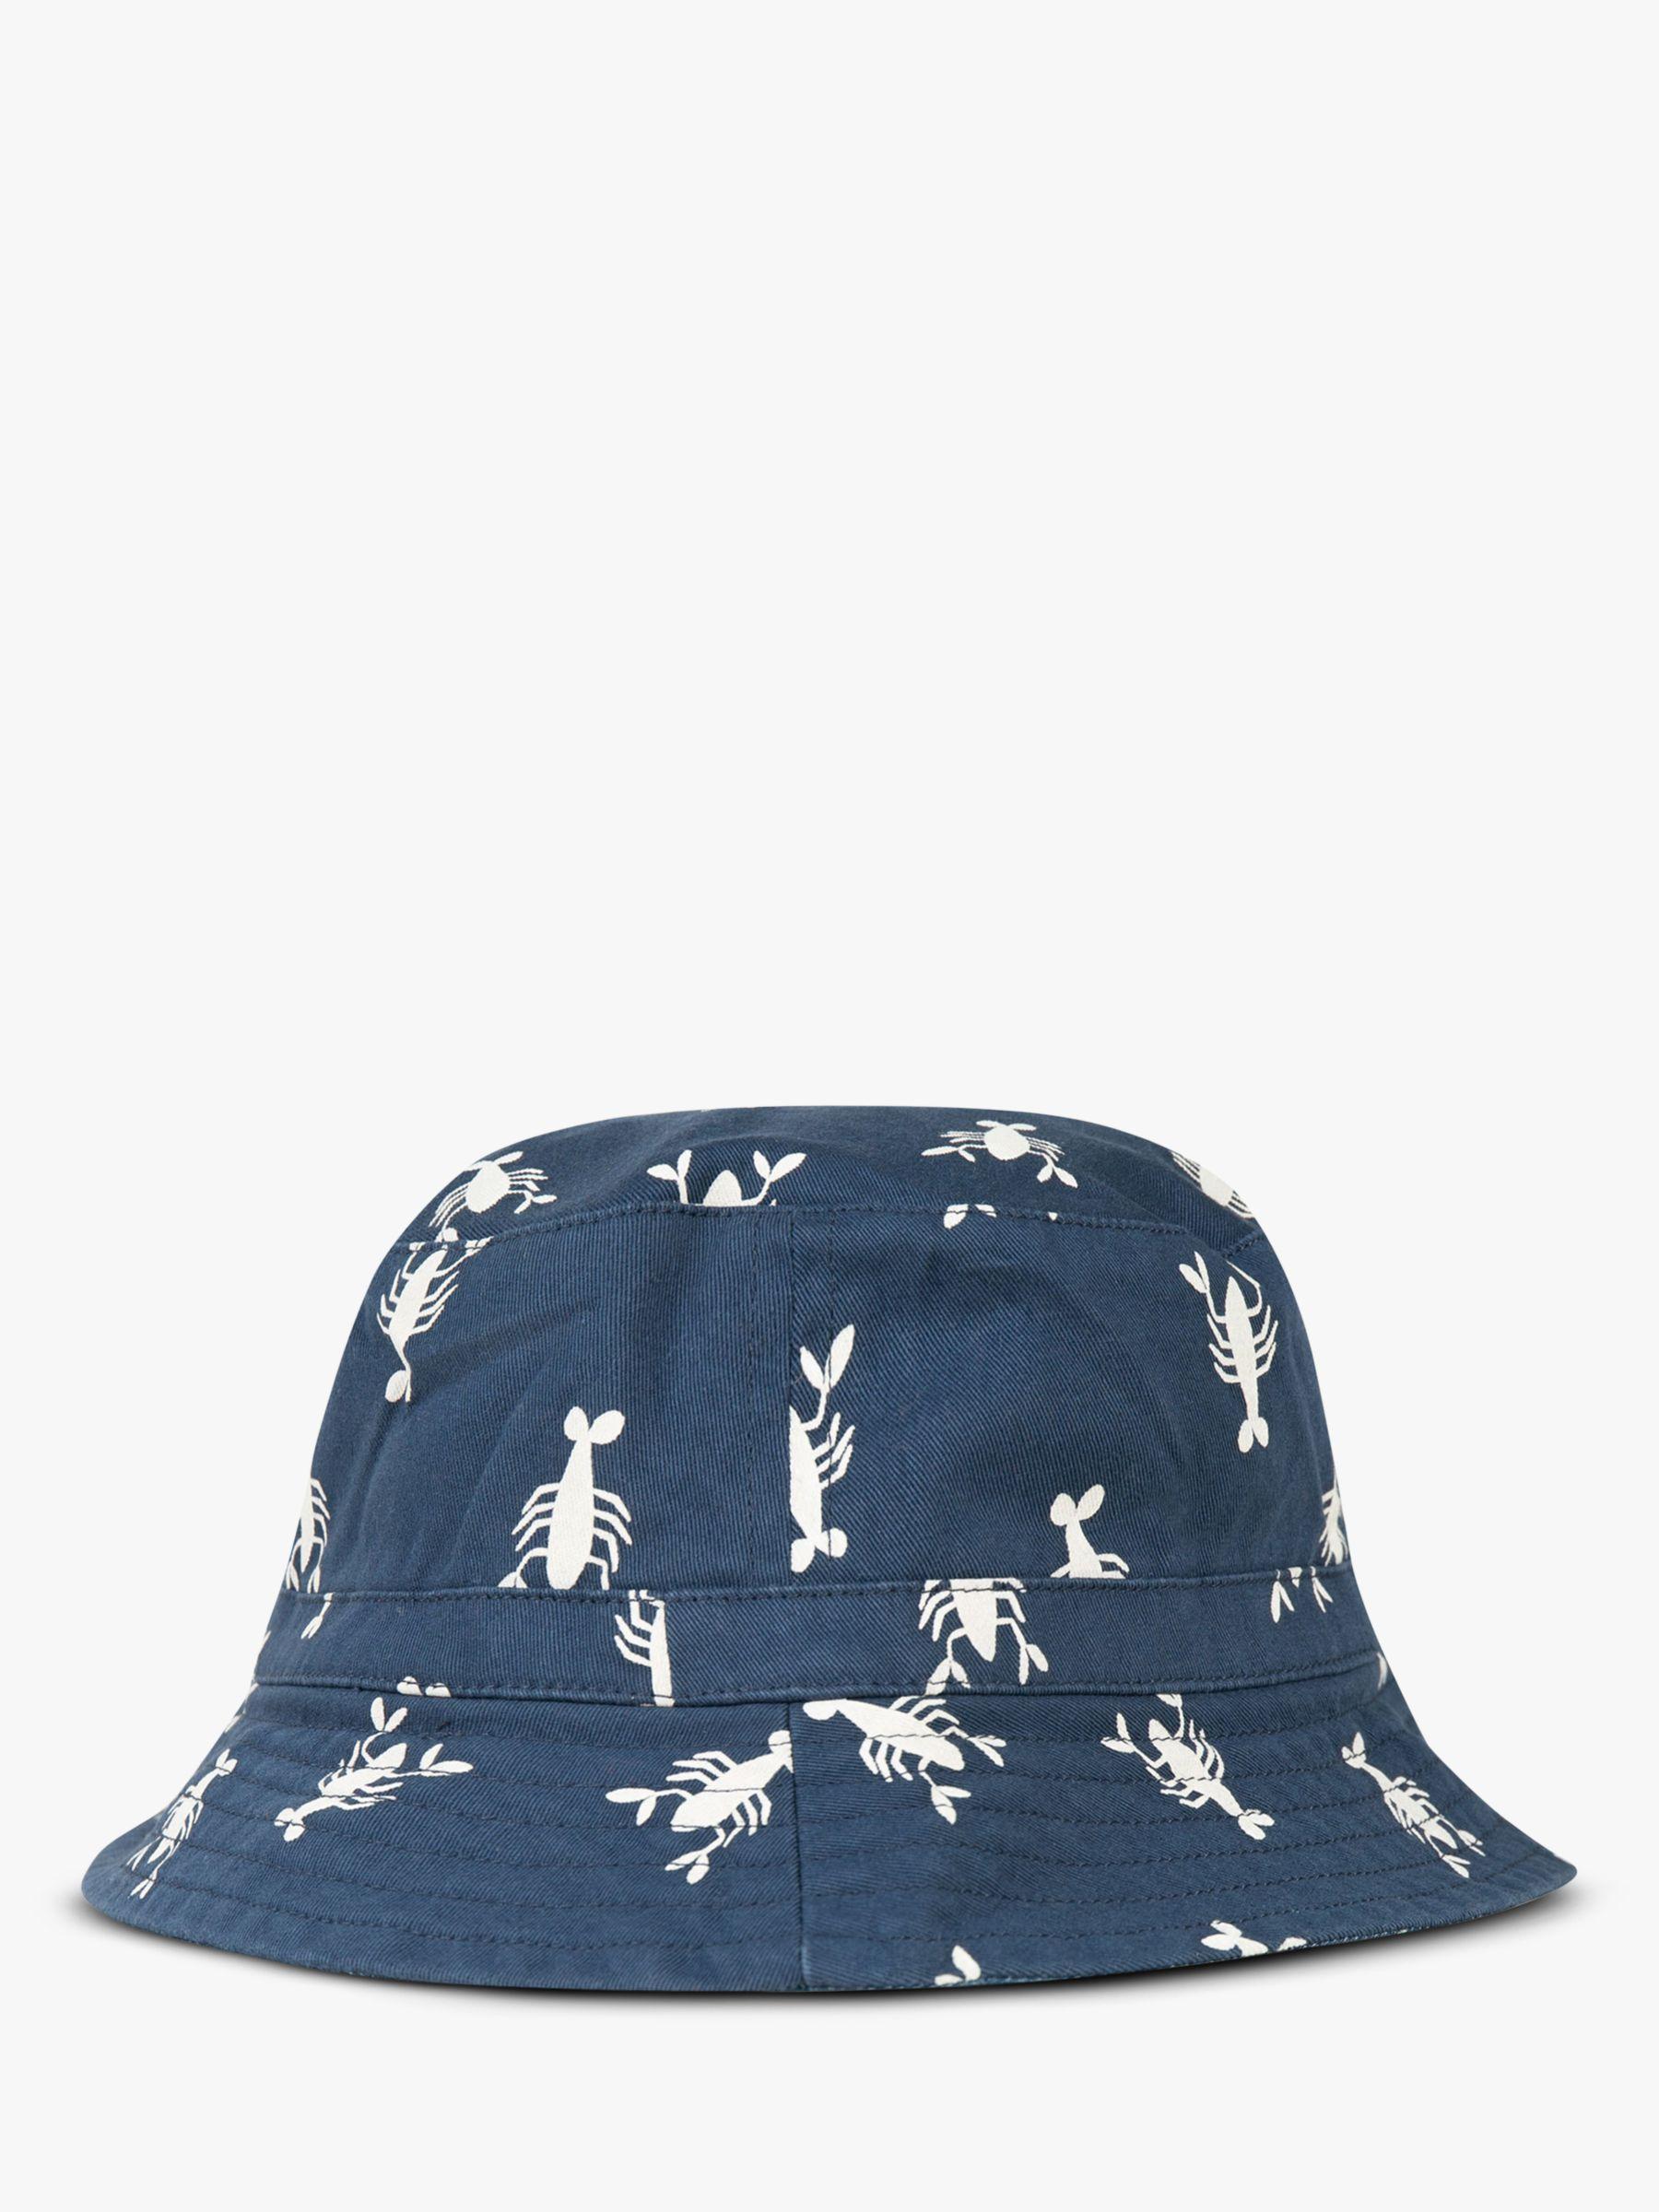 Frugi Frugi Children's GOTS Organic Cotton Ross Reversible Lobster Hat, Blue